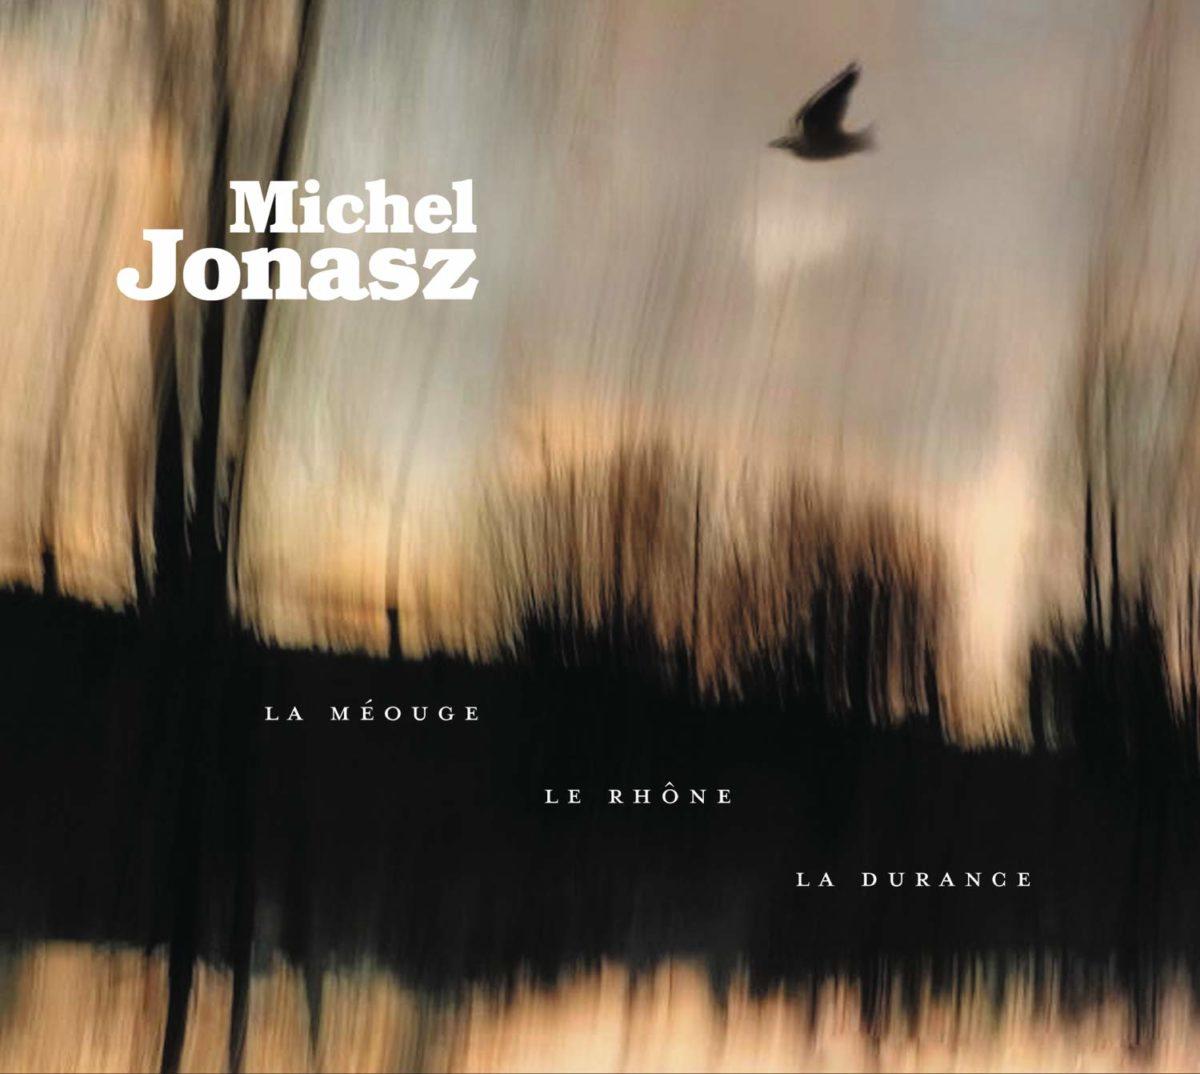 Michel-Jonasz-album-2019